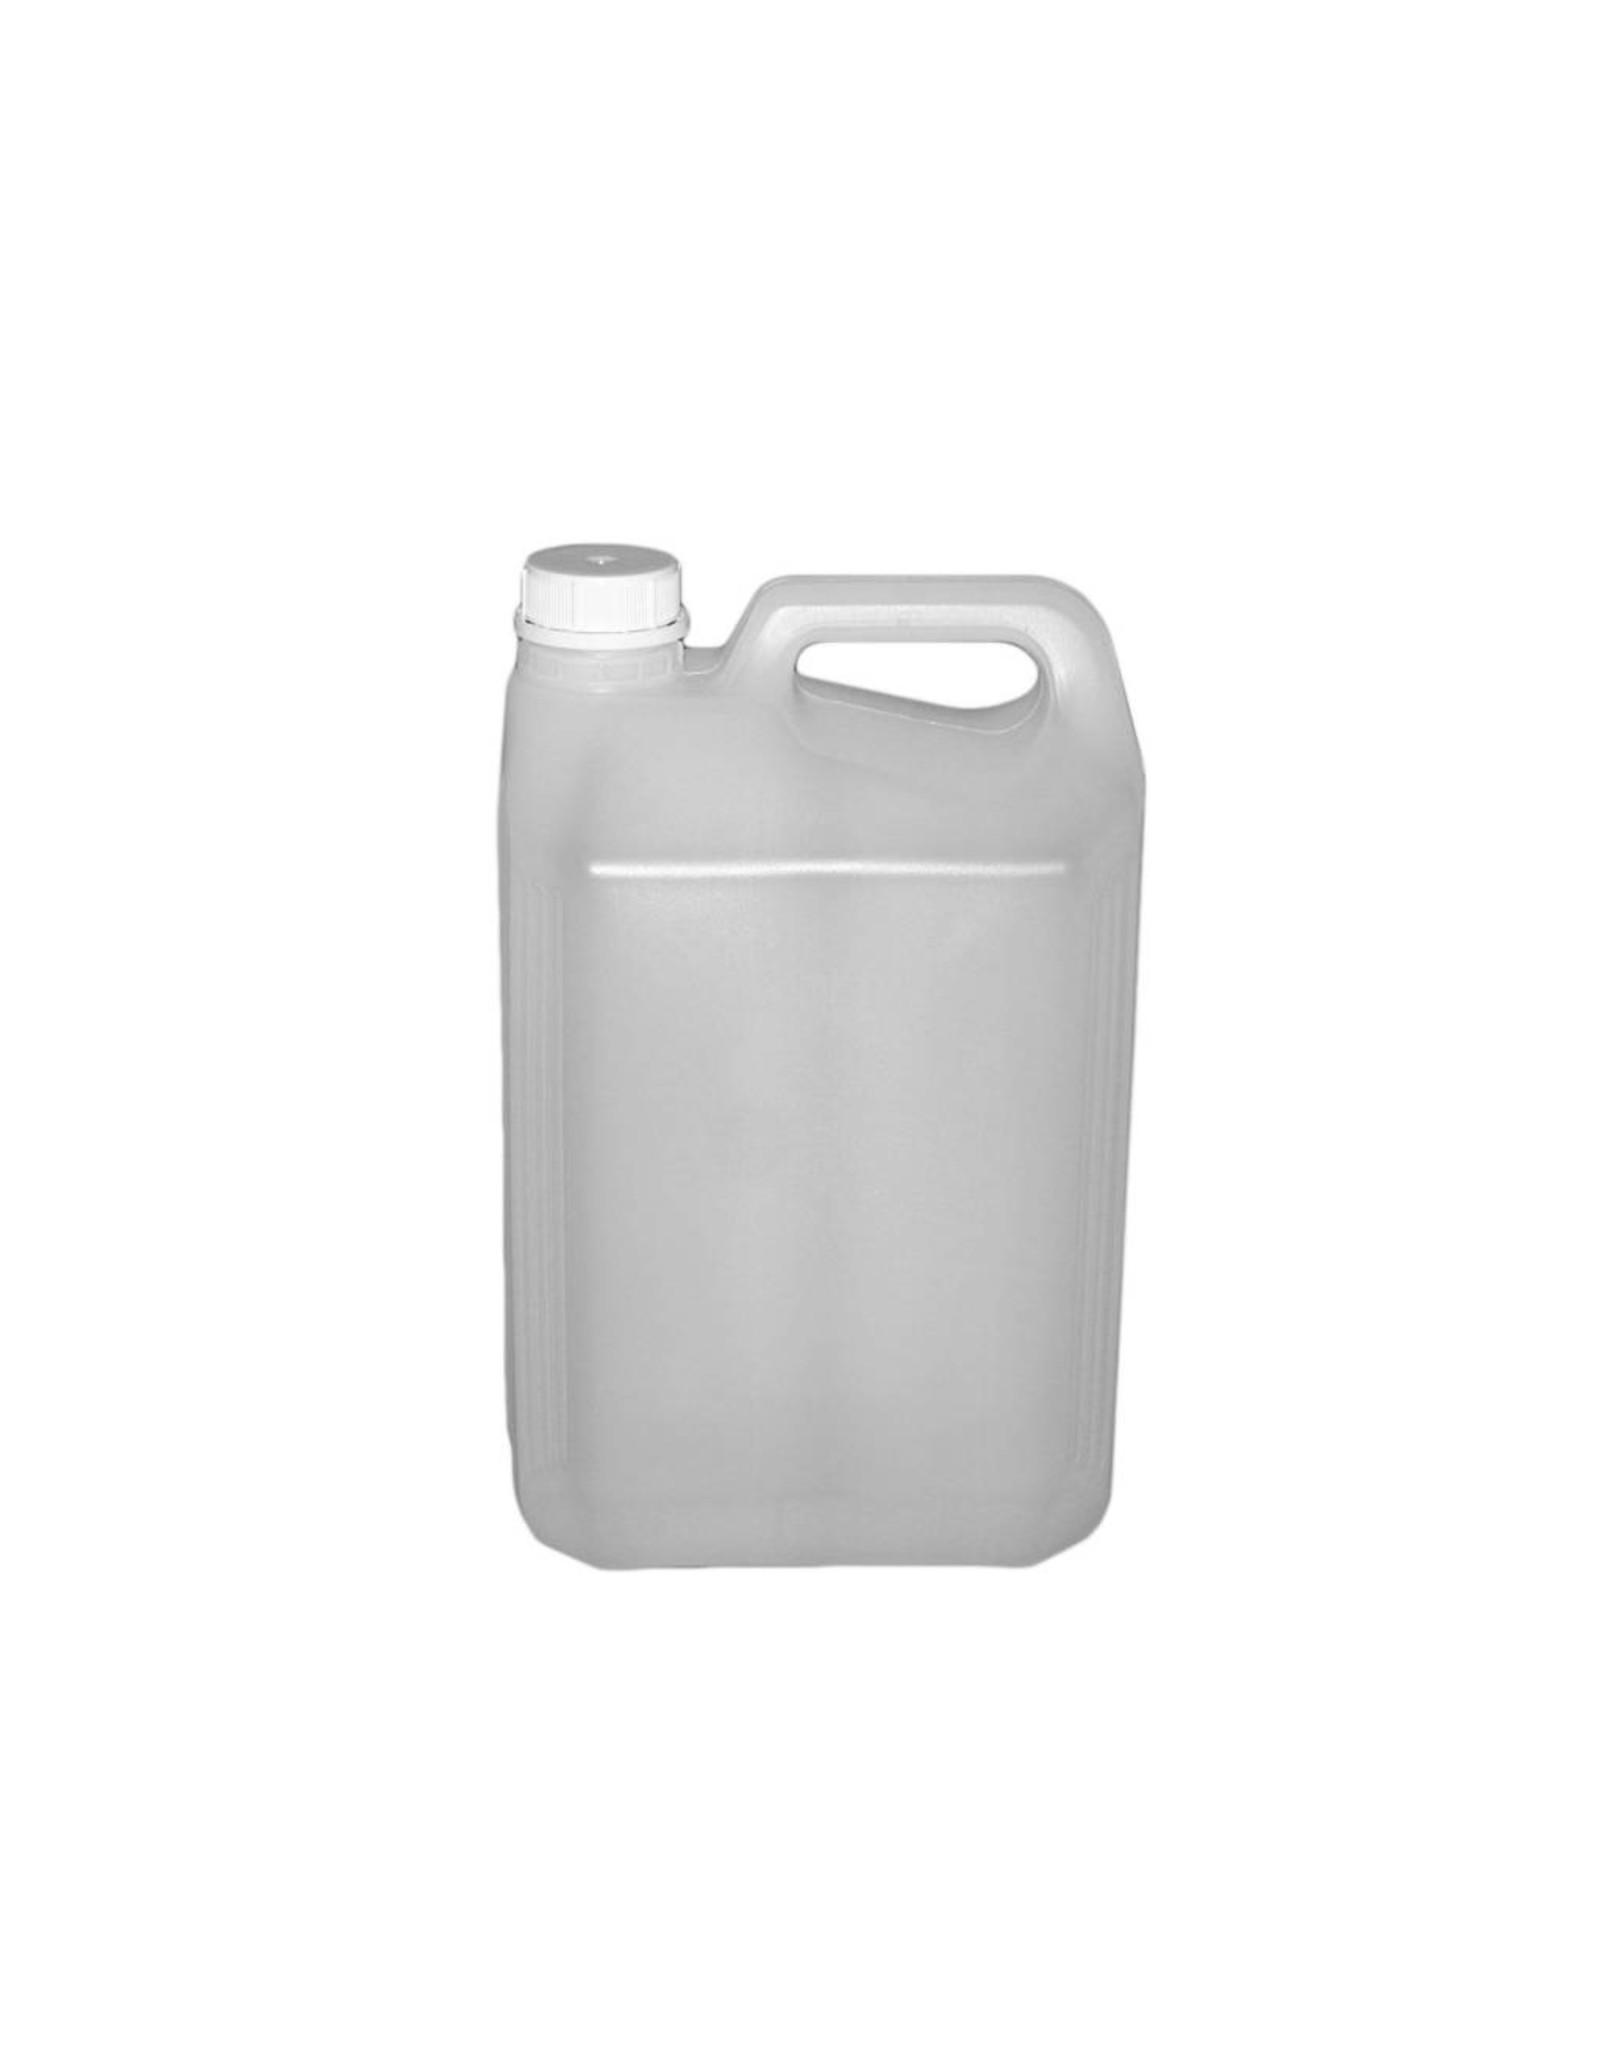 Merkloos Jerrycans 5 liter